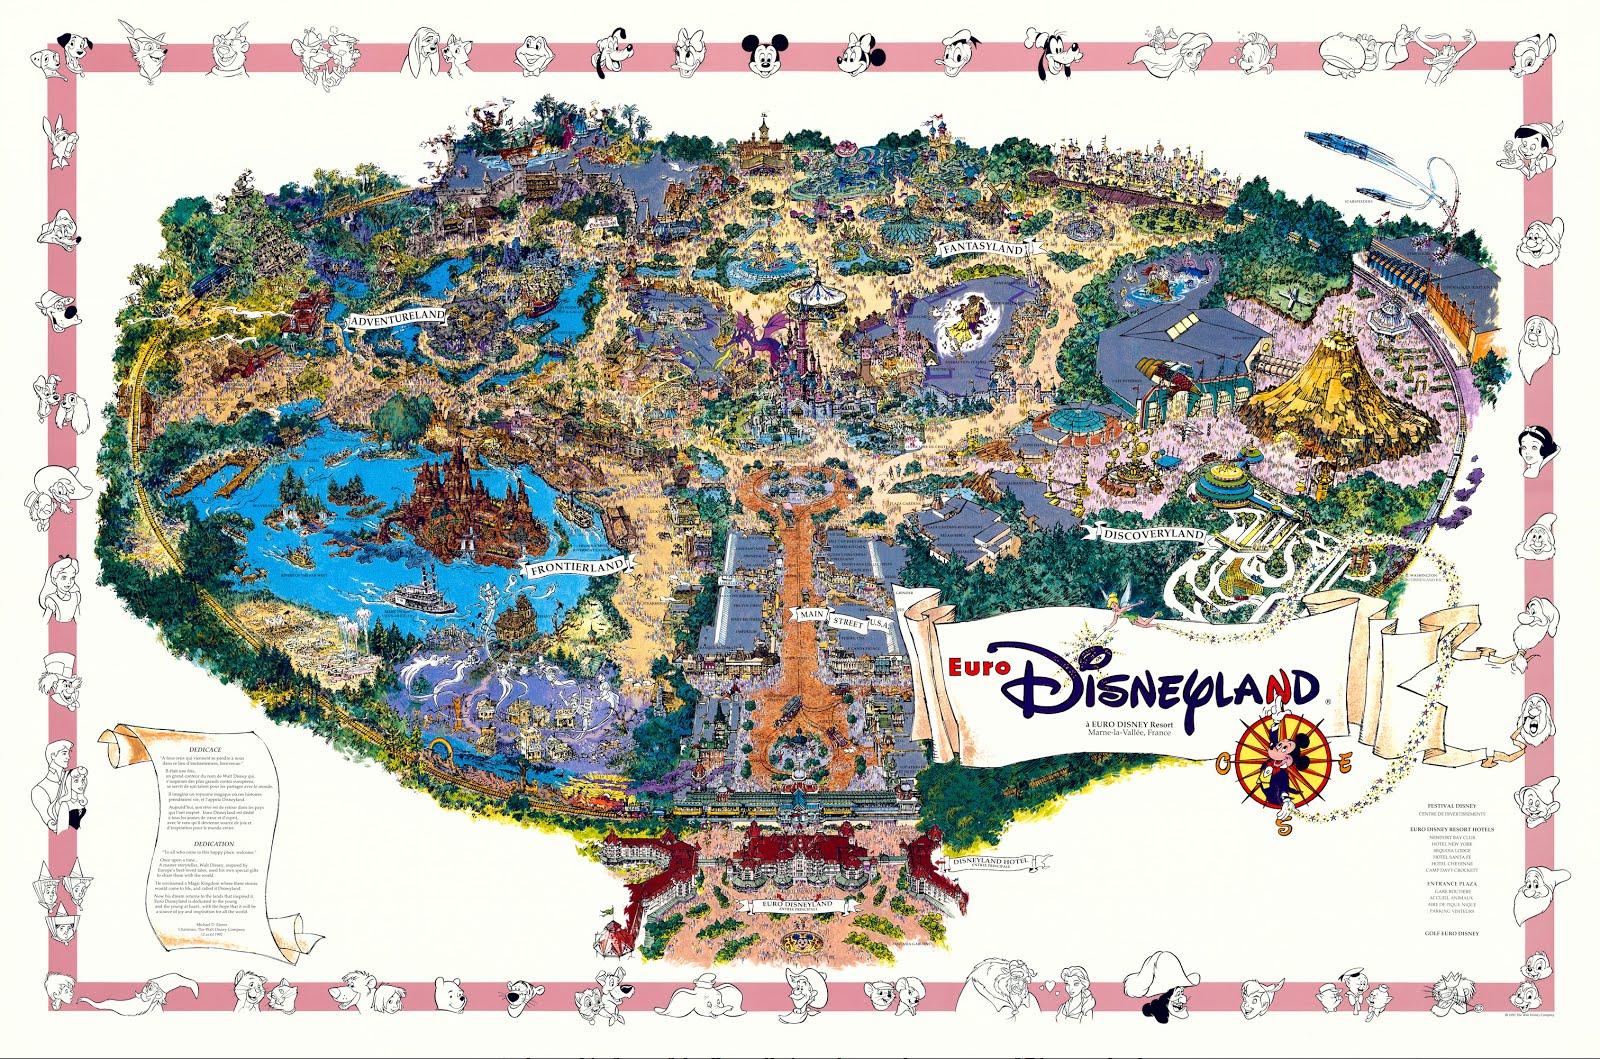 Disneyland Park Map Sam Carter mammoth lakes map map of malawi